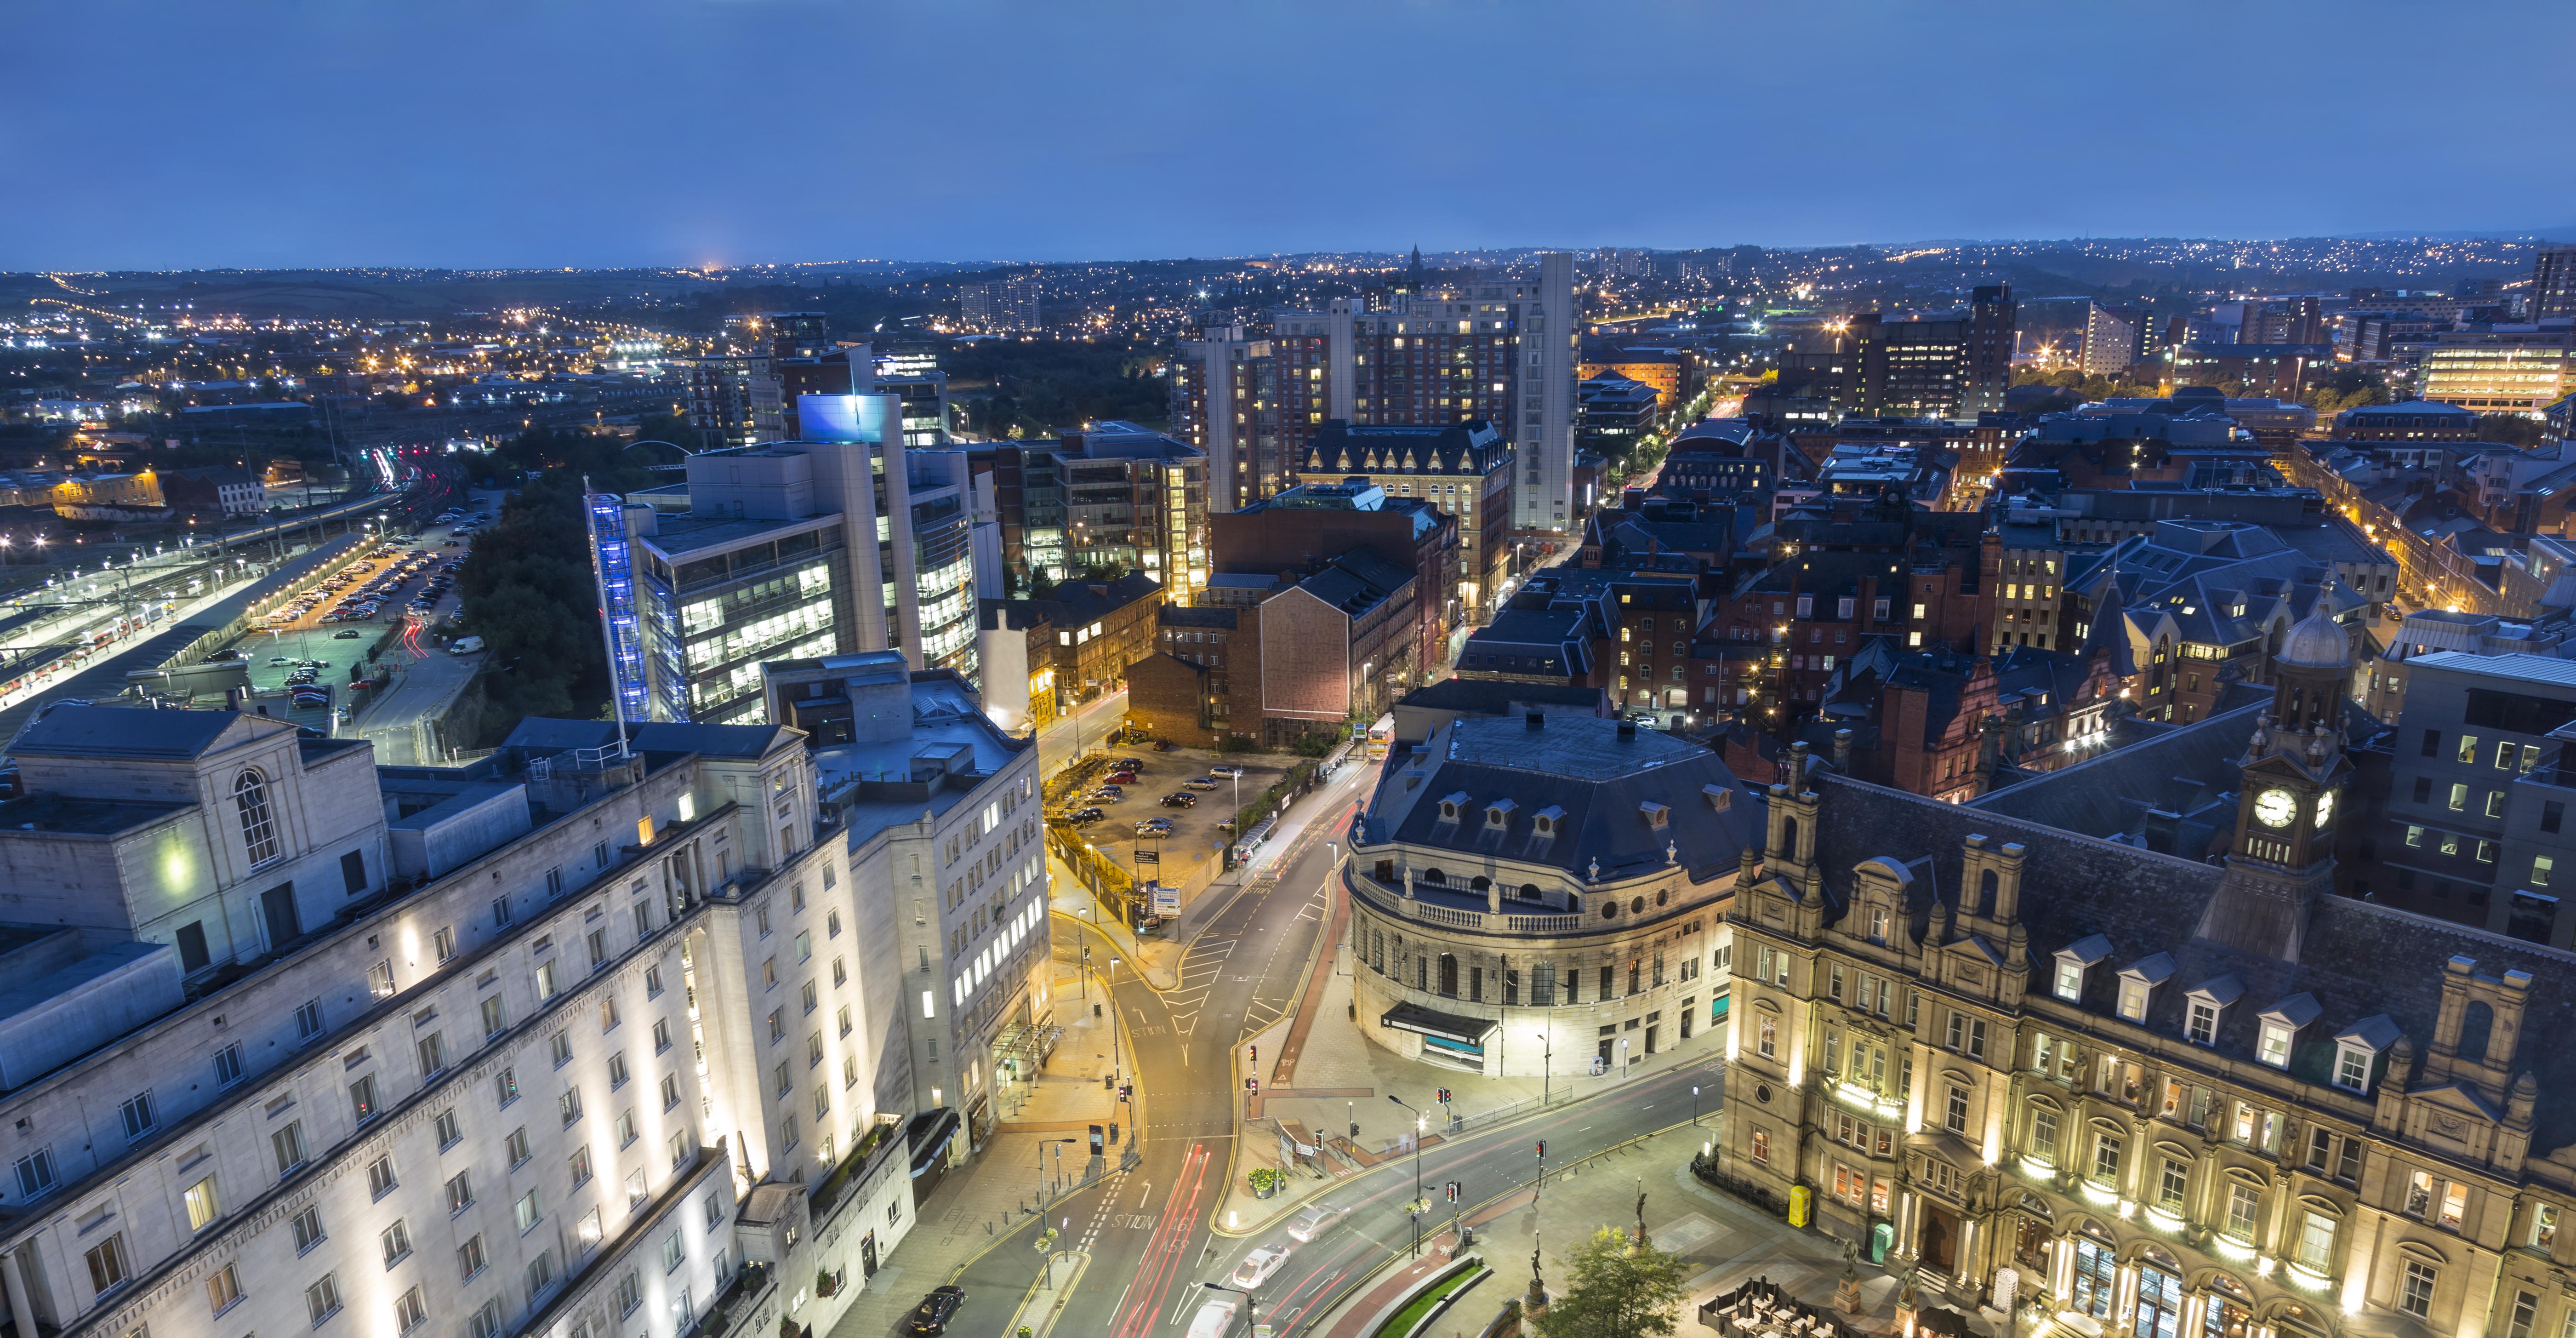 Leeds - An Exciting Tech Hub